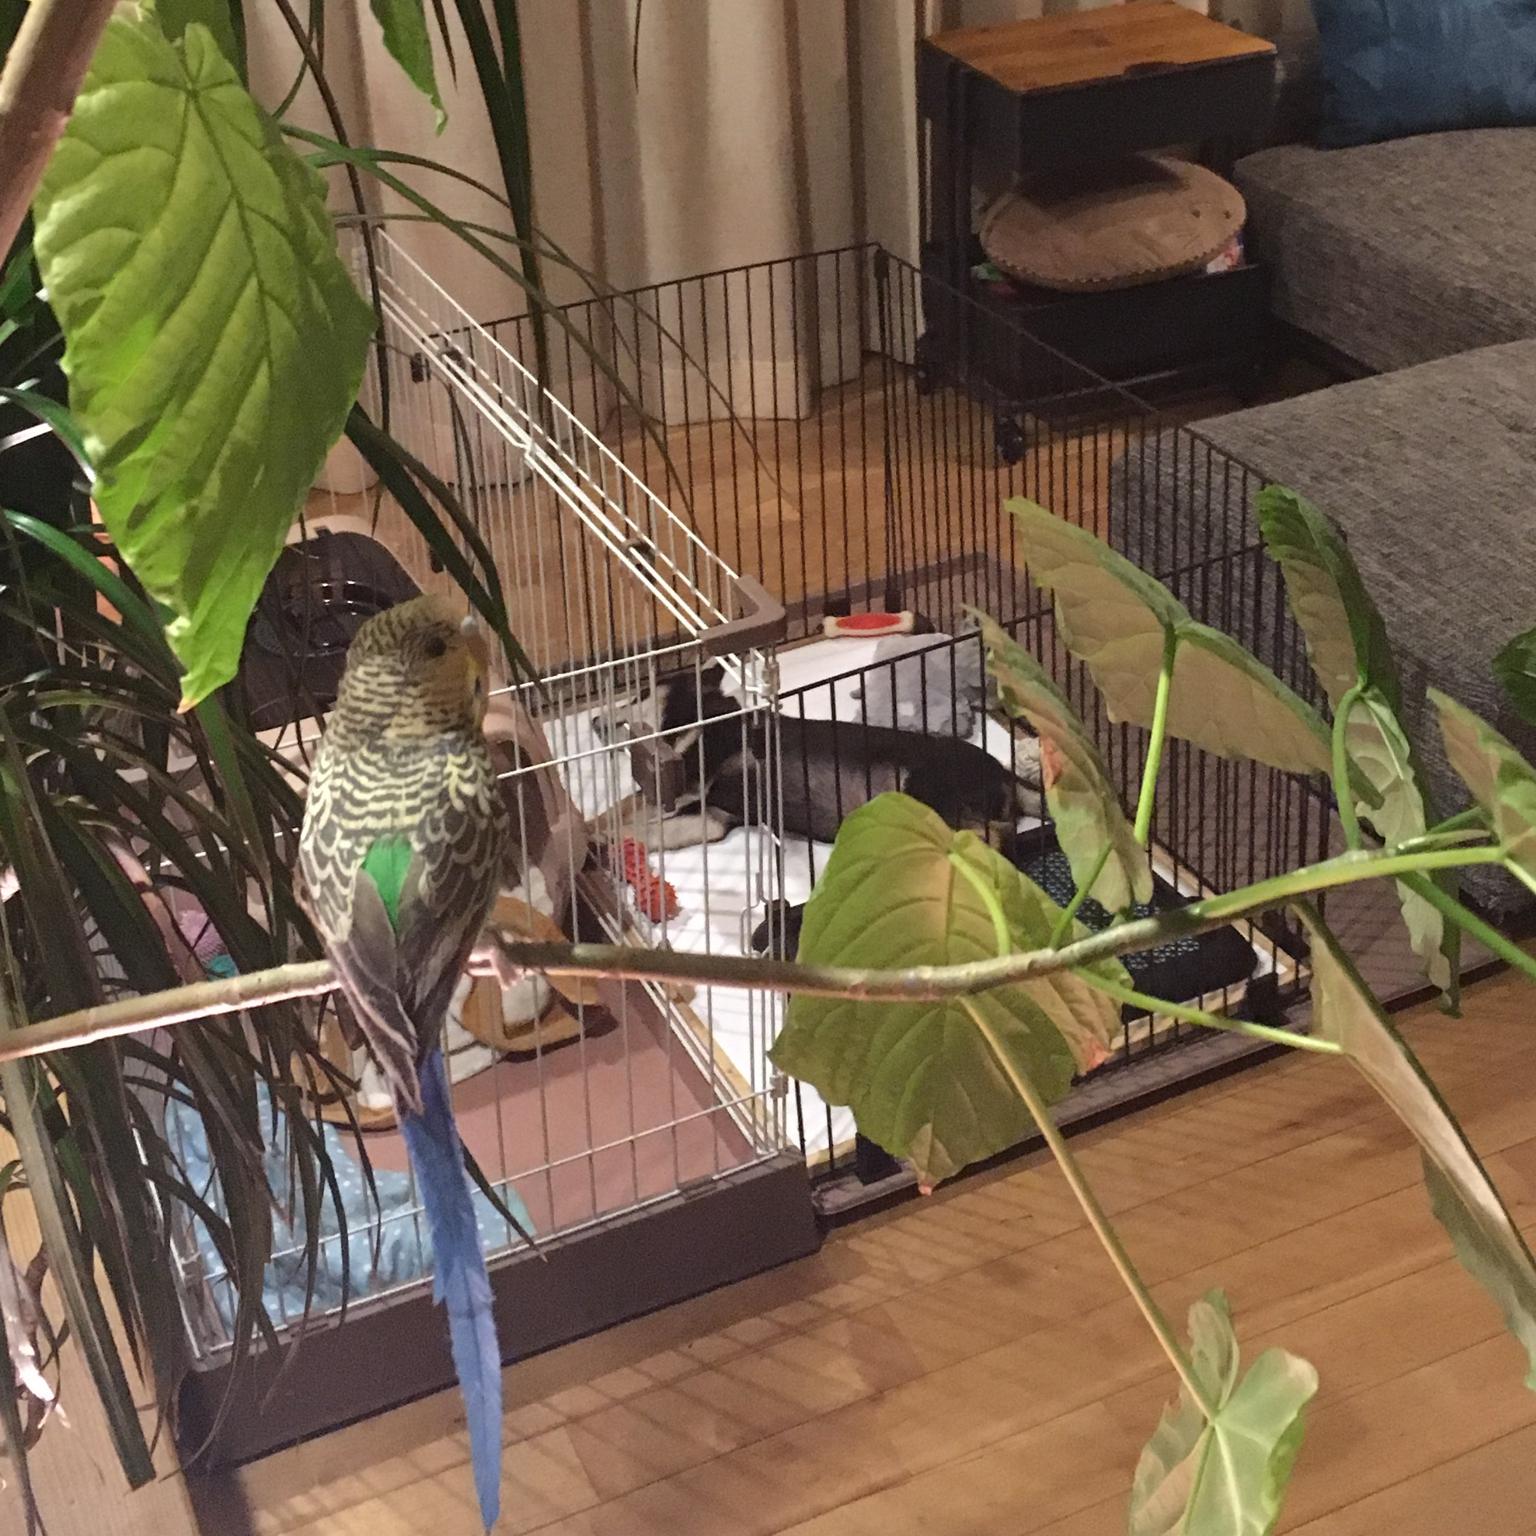 Lounge/お犬様優先なりに関連する部屋のインテリア実例